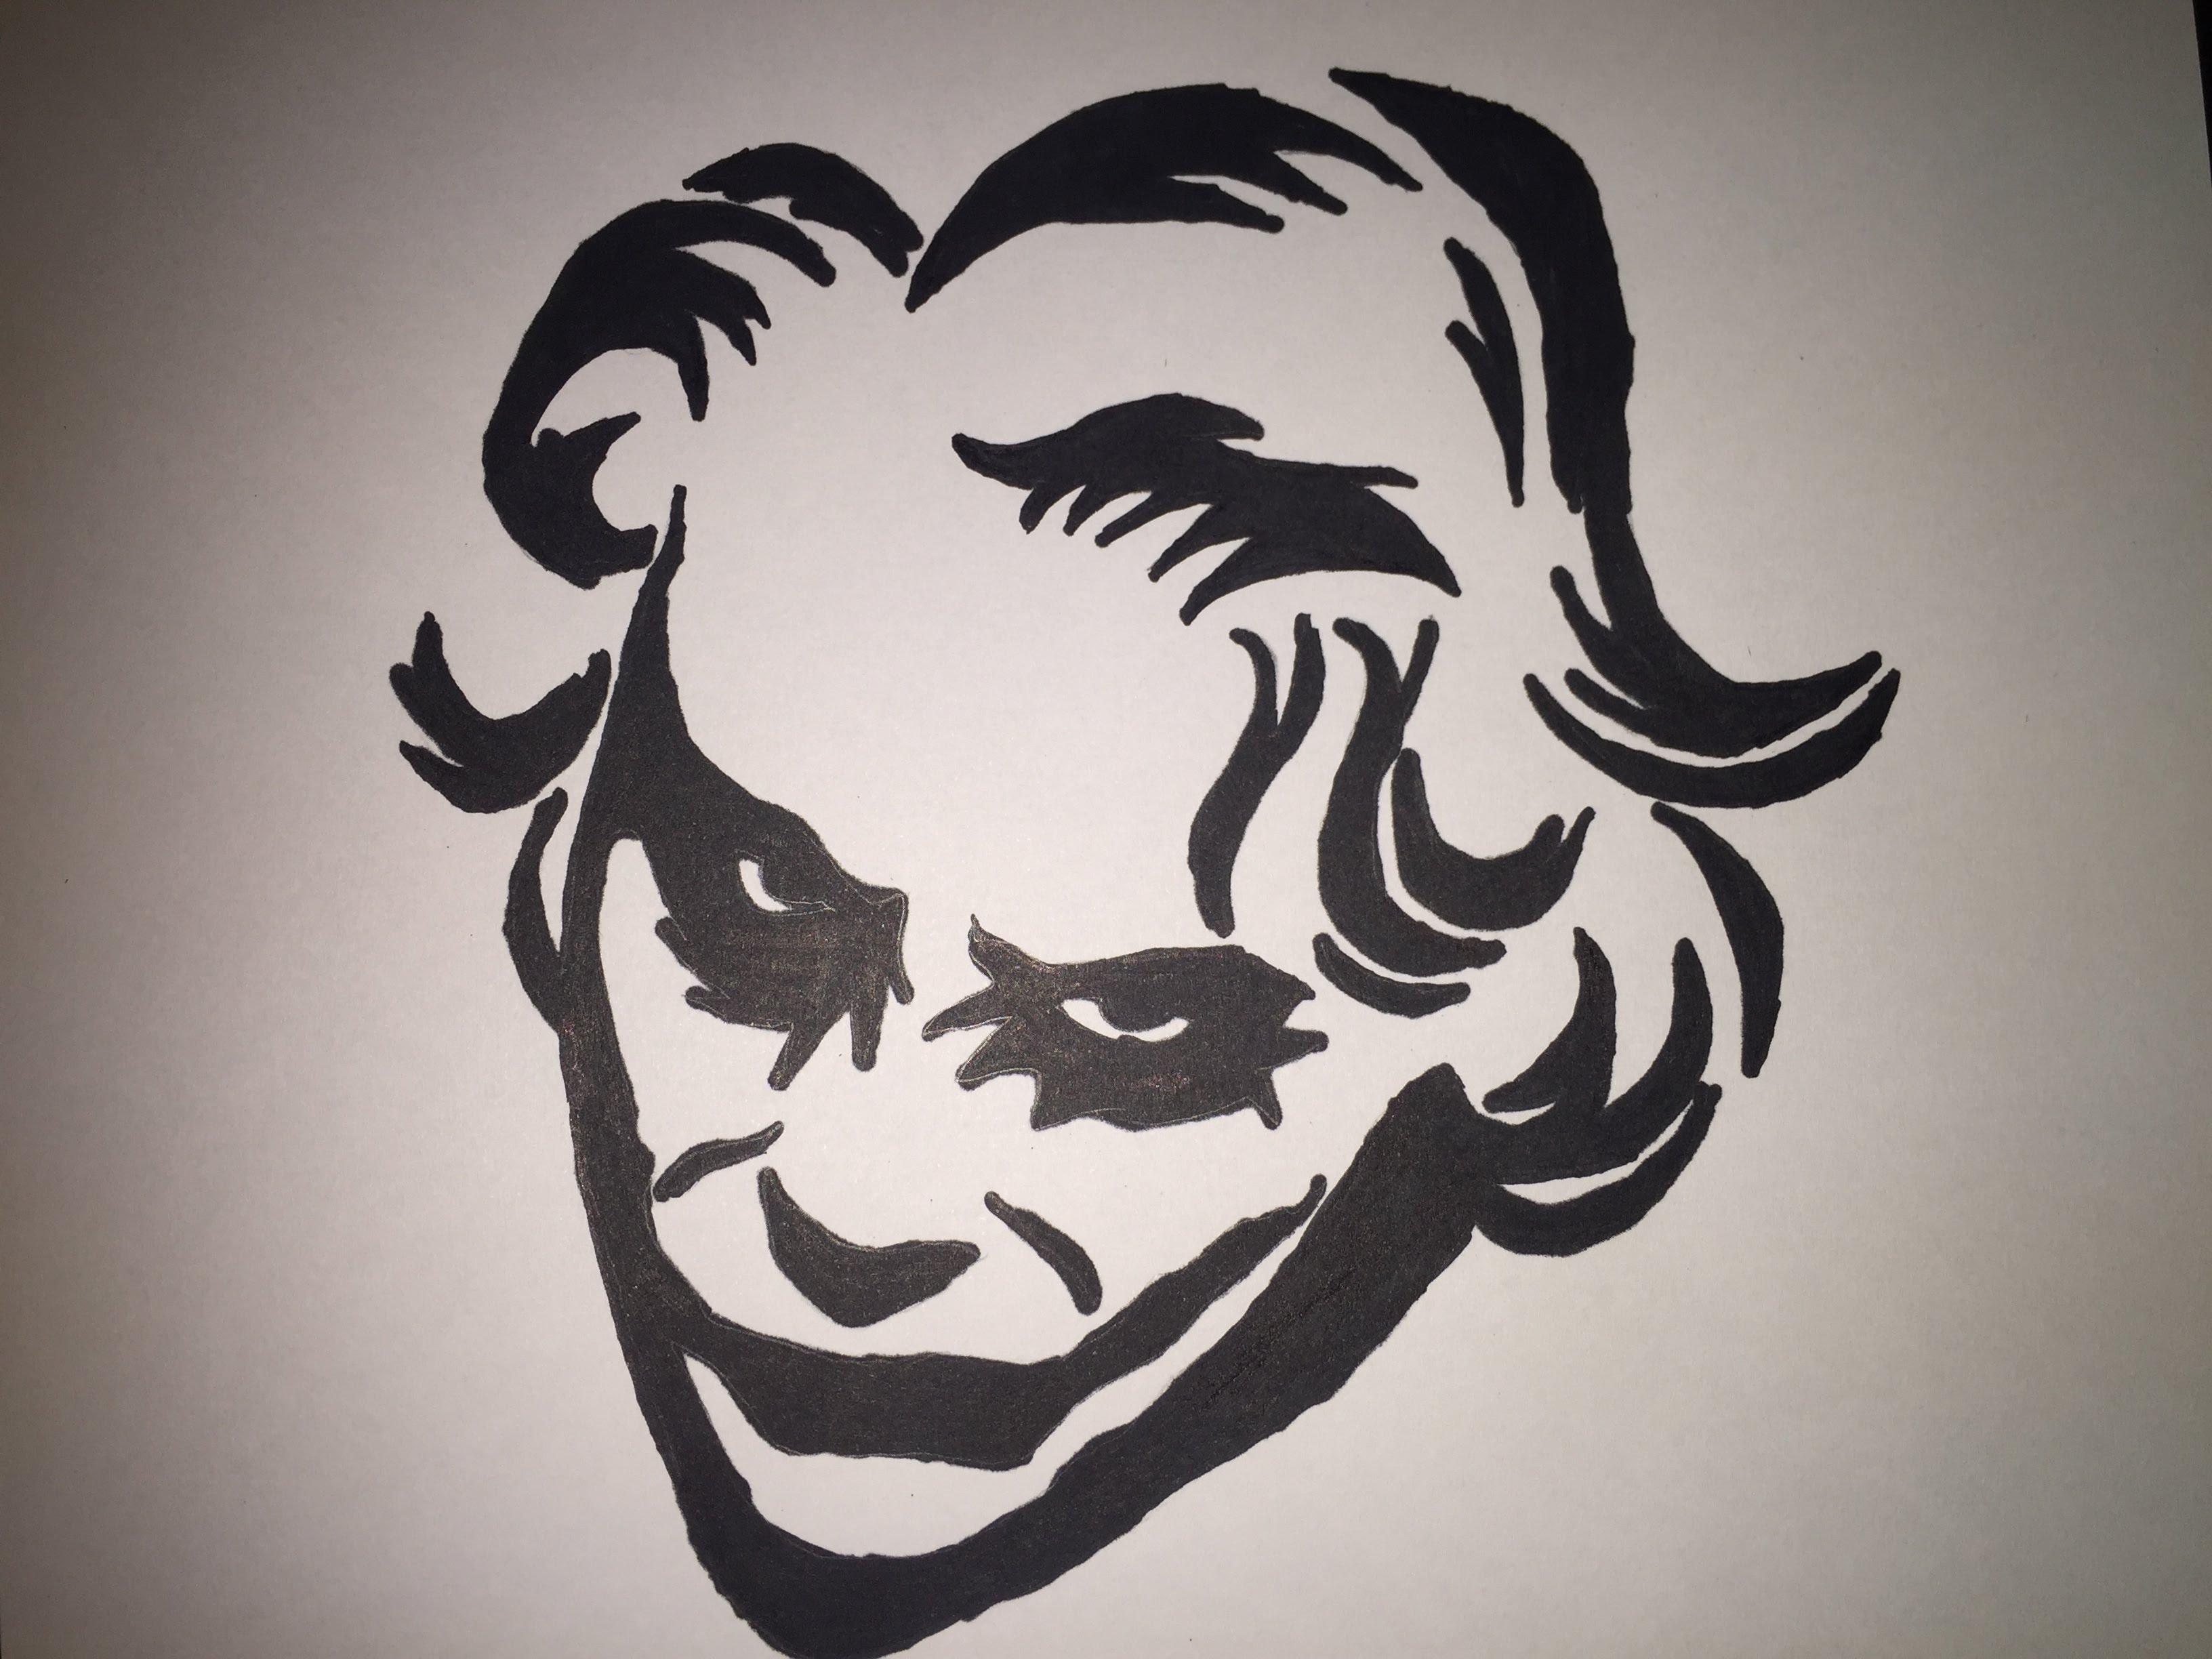 3264x2448 How To Draw Joker!!! (Tribal Art)